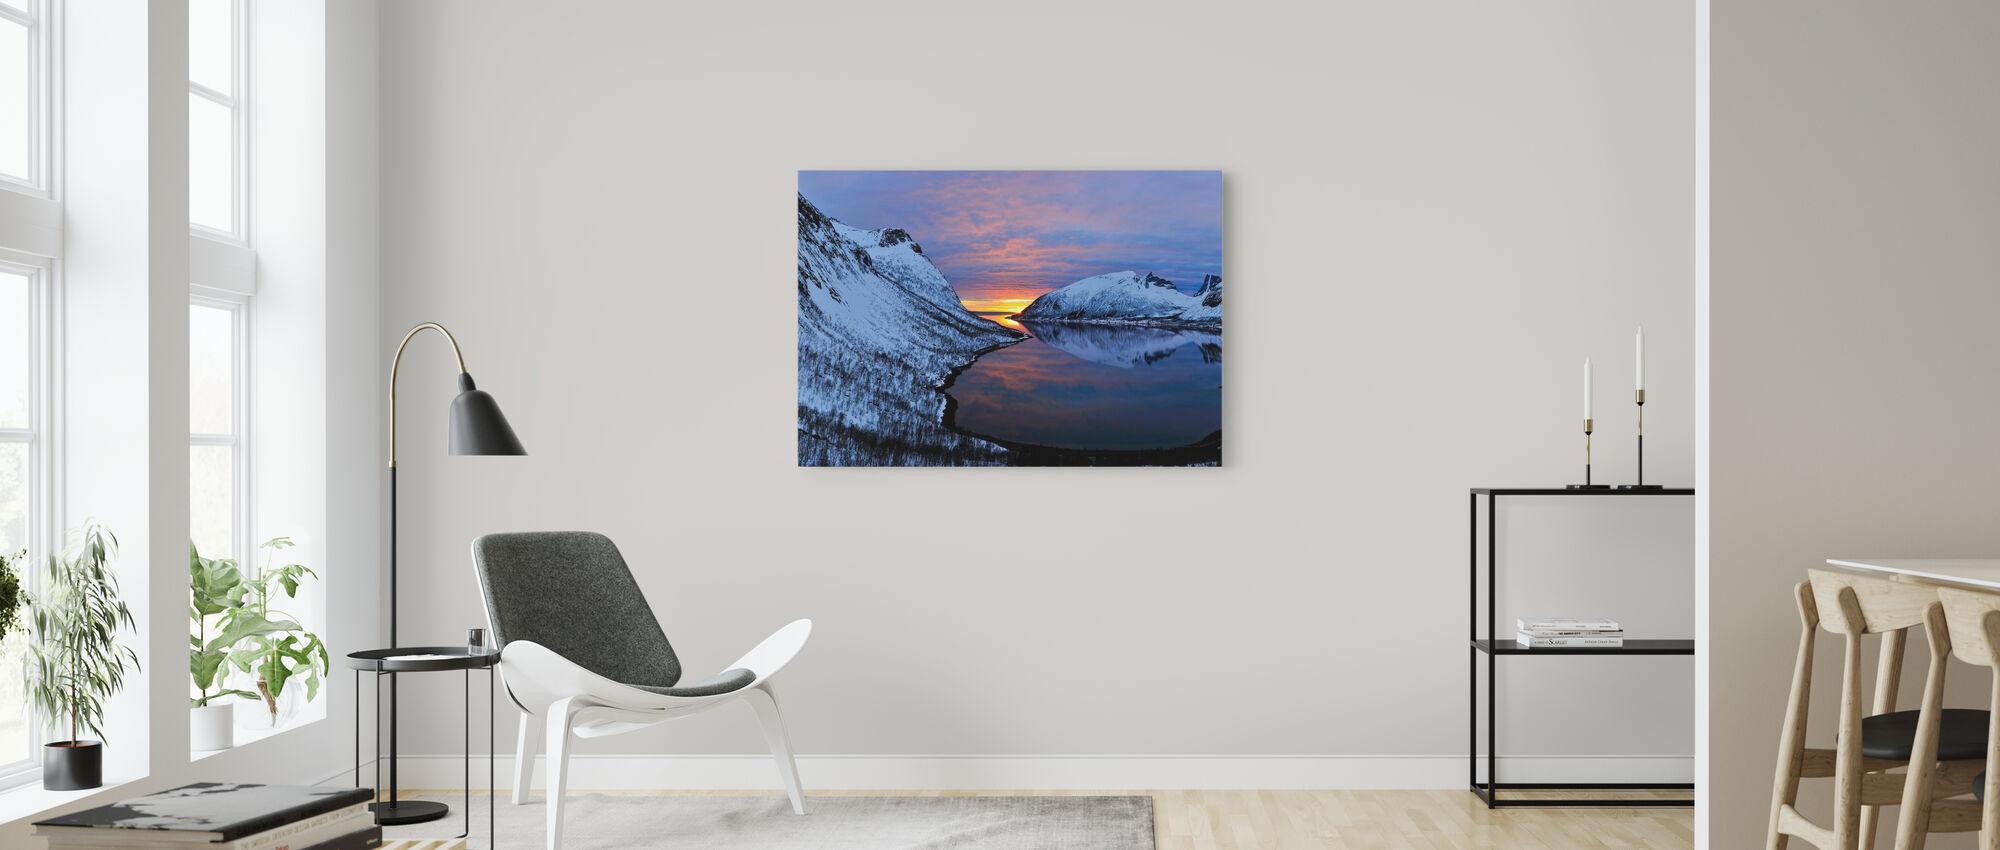 Golden Sunset över Troms, Norge - Canvastavla - Vardagsrum